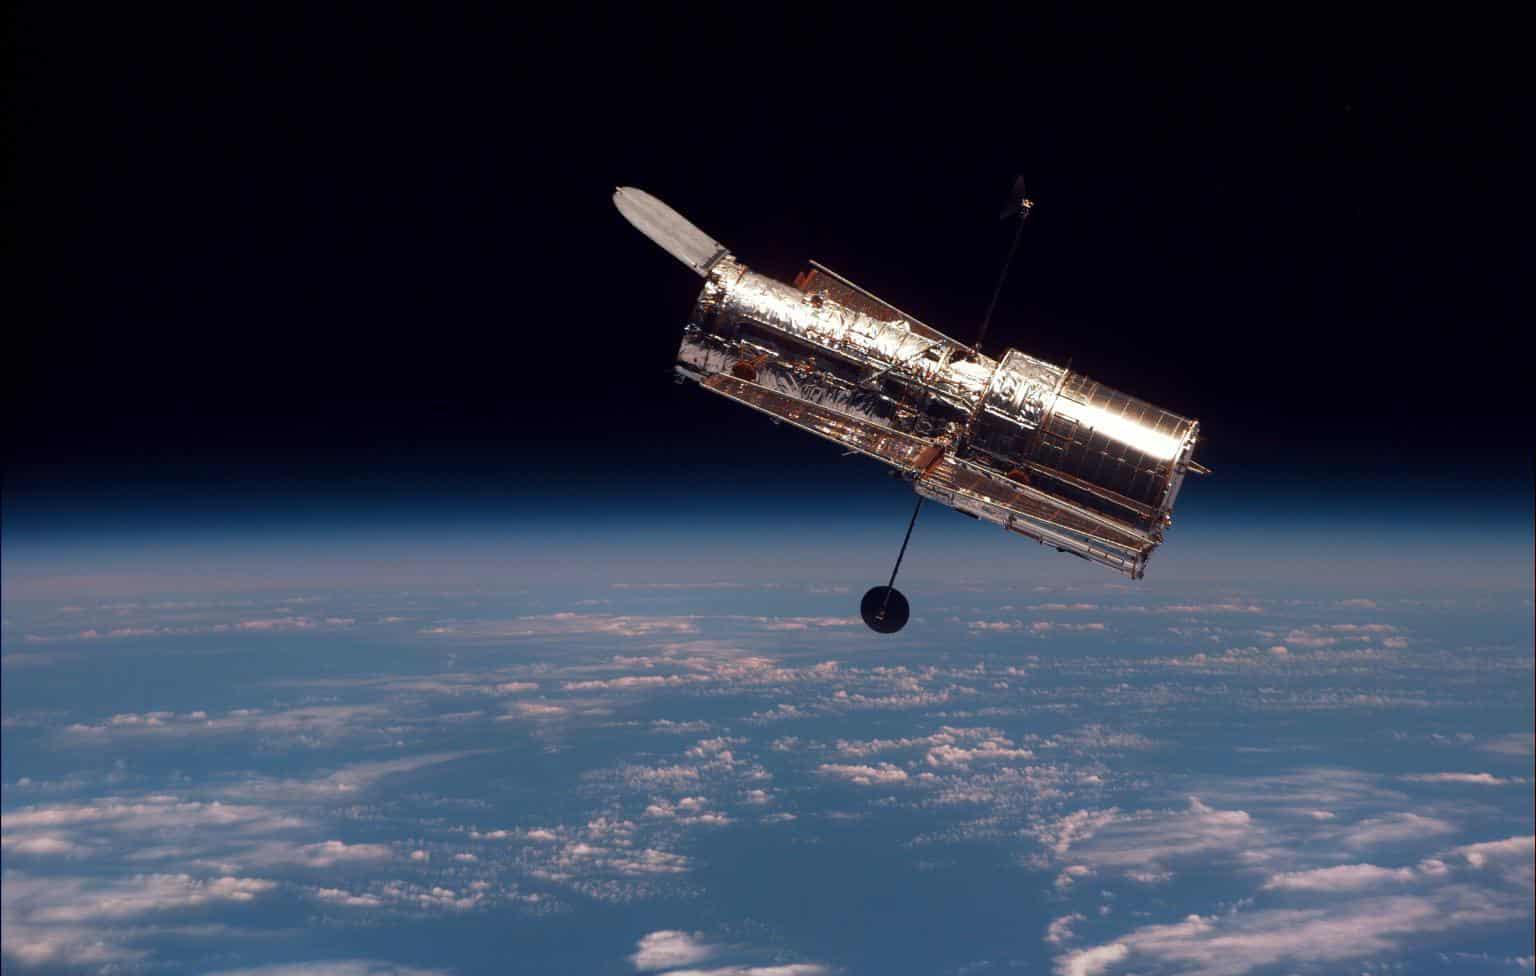 Telescópio Hubble aparentemente morreu de vez :(